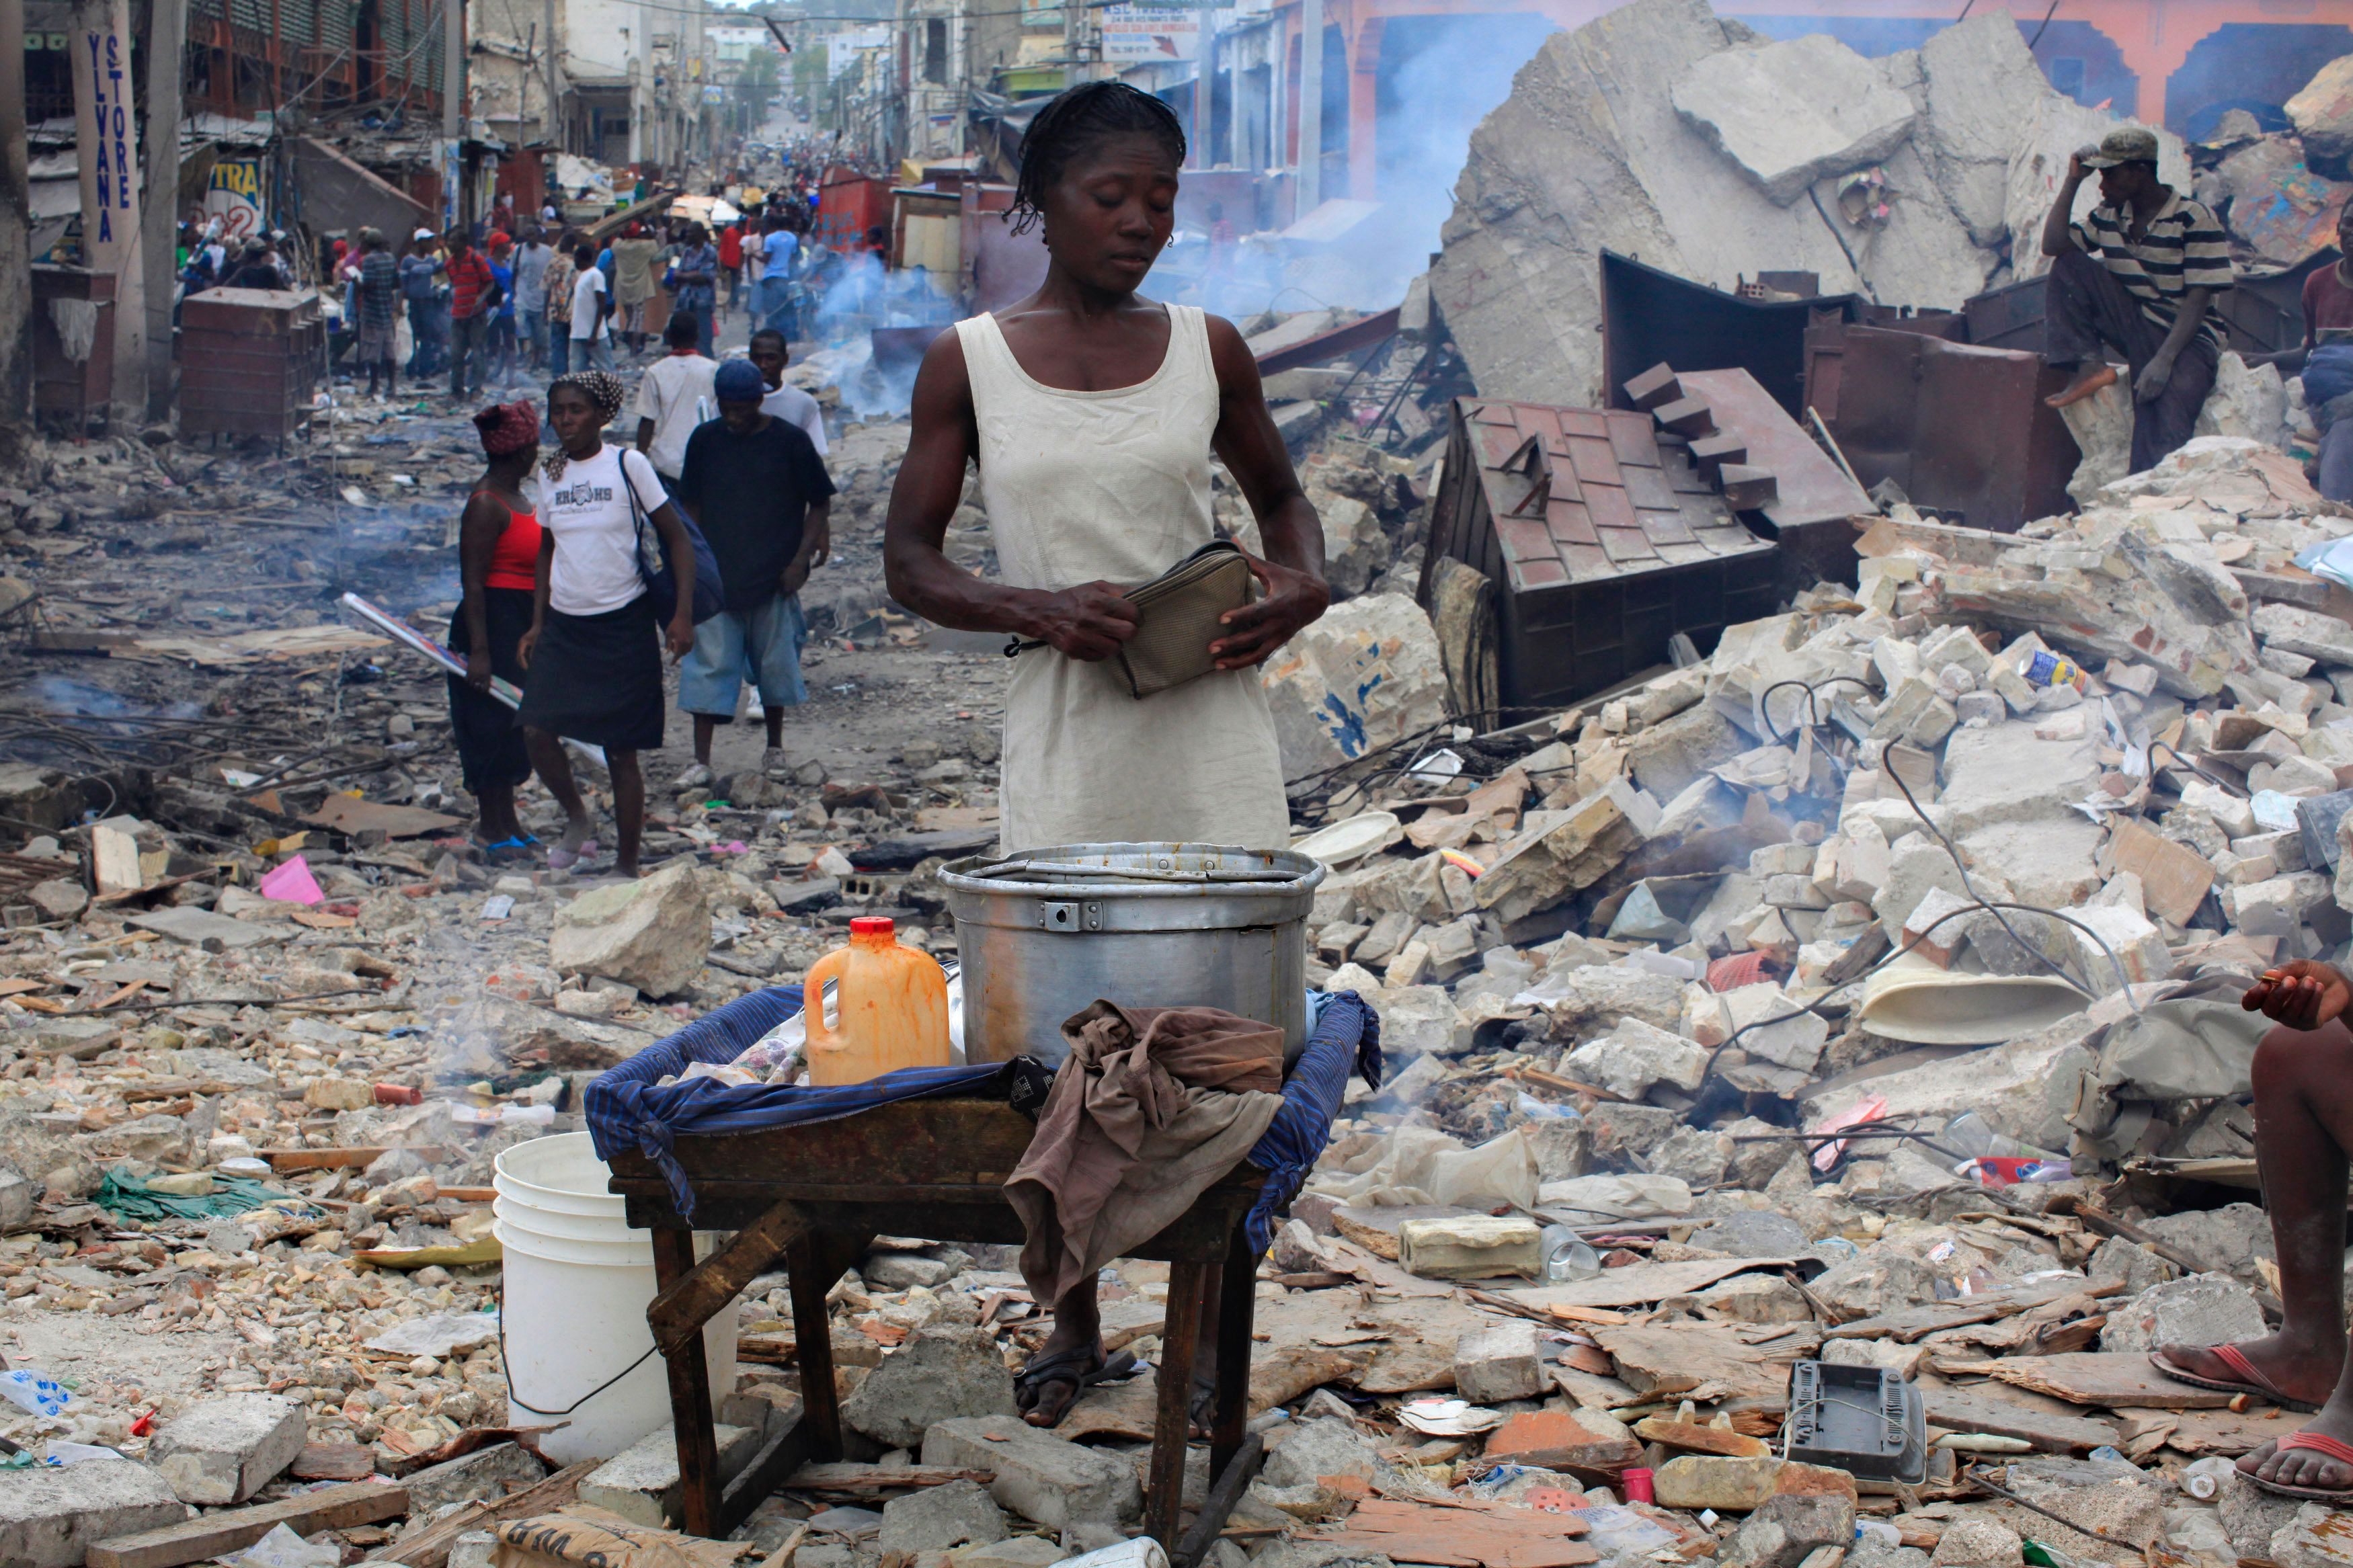 Trump's Haiti Slap Came On Eve Of Earthquake Anniversary